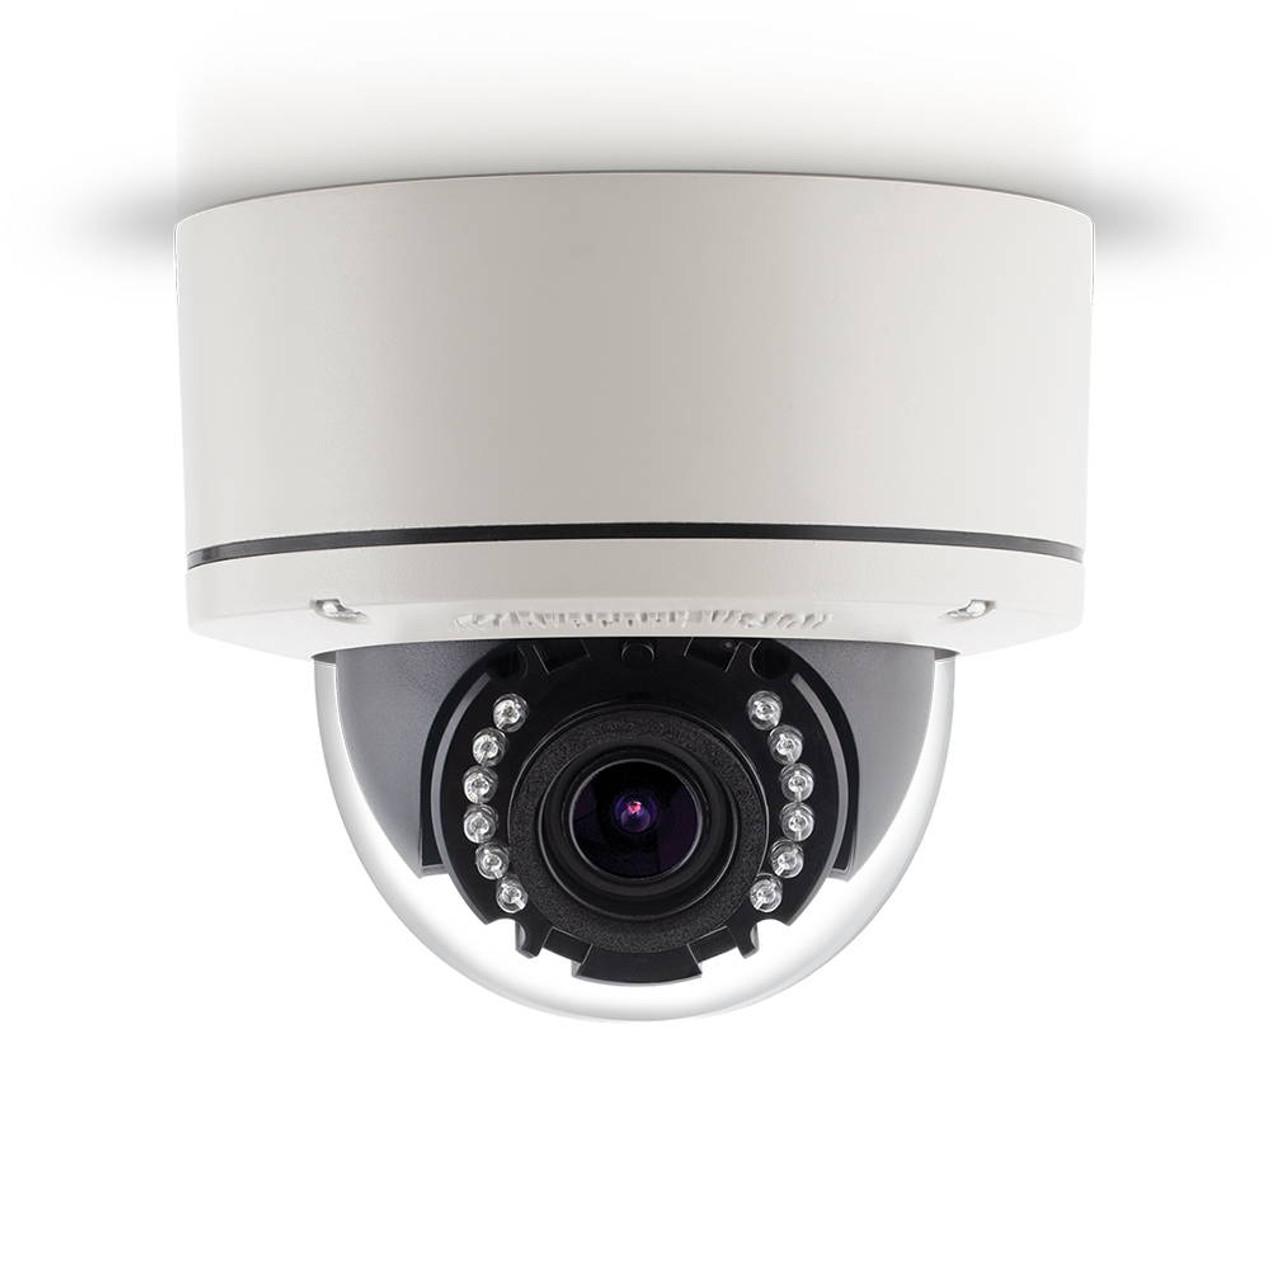 ARECONT VISION AV2255DN IP CAMERA WINDOWS 7 64BIT DRIVER DOWNLOAD